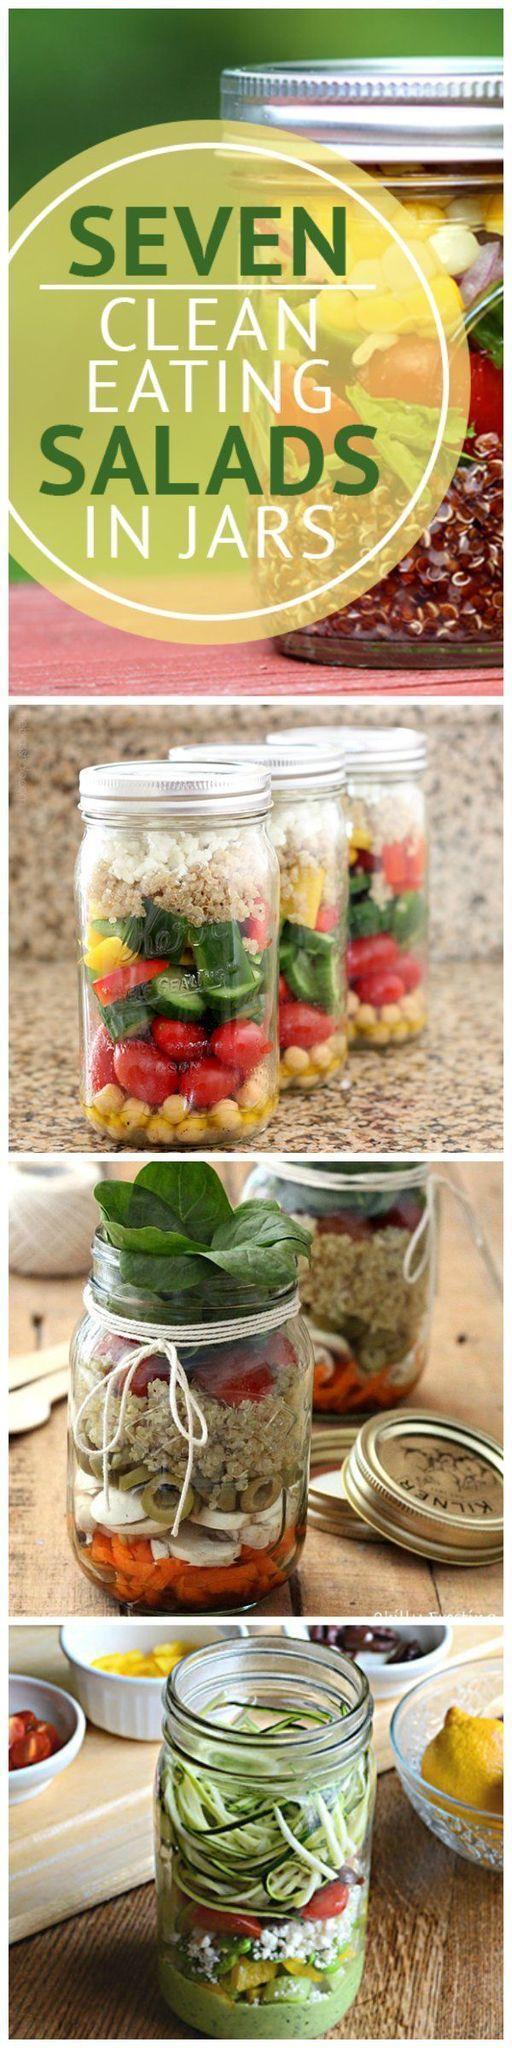 Cute, practical, and tasty! 7 Clean Eating Salads in Jars! #SkinnyMs